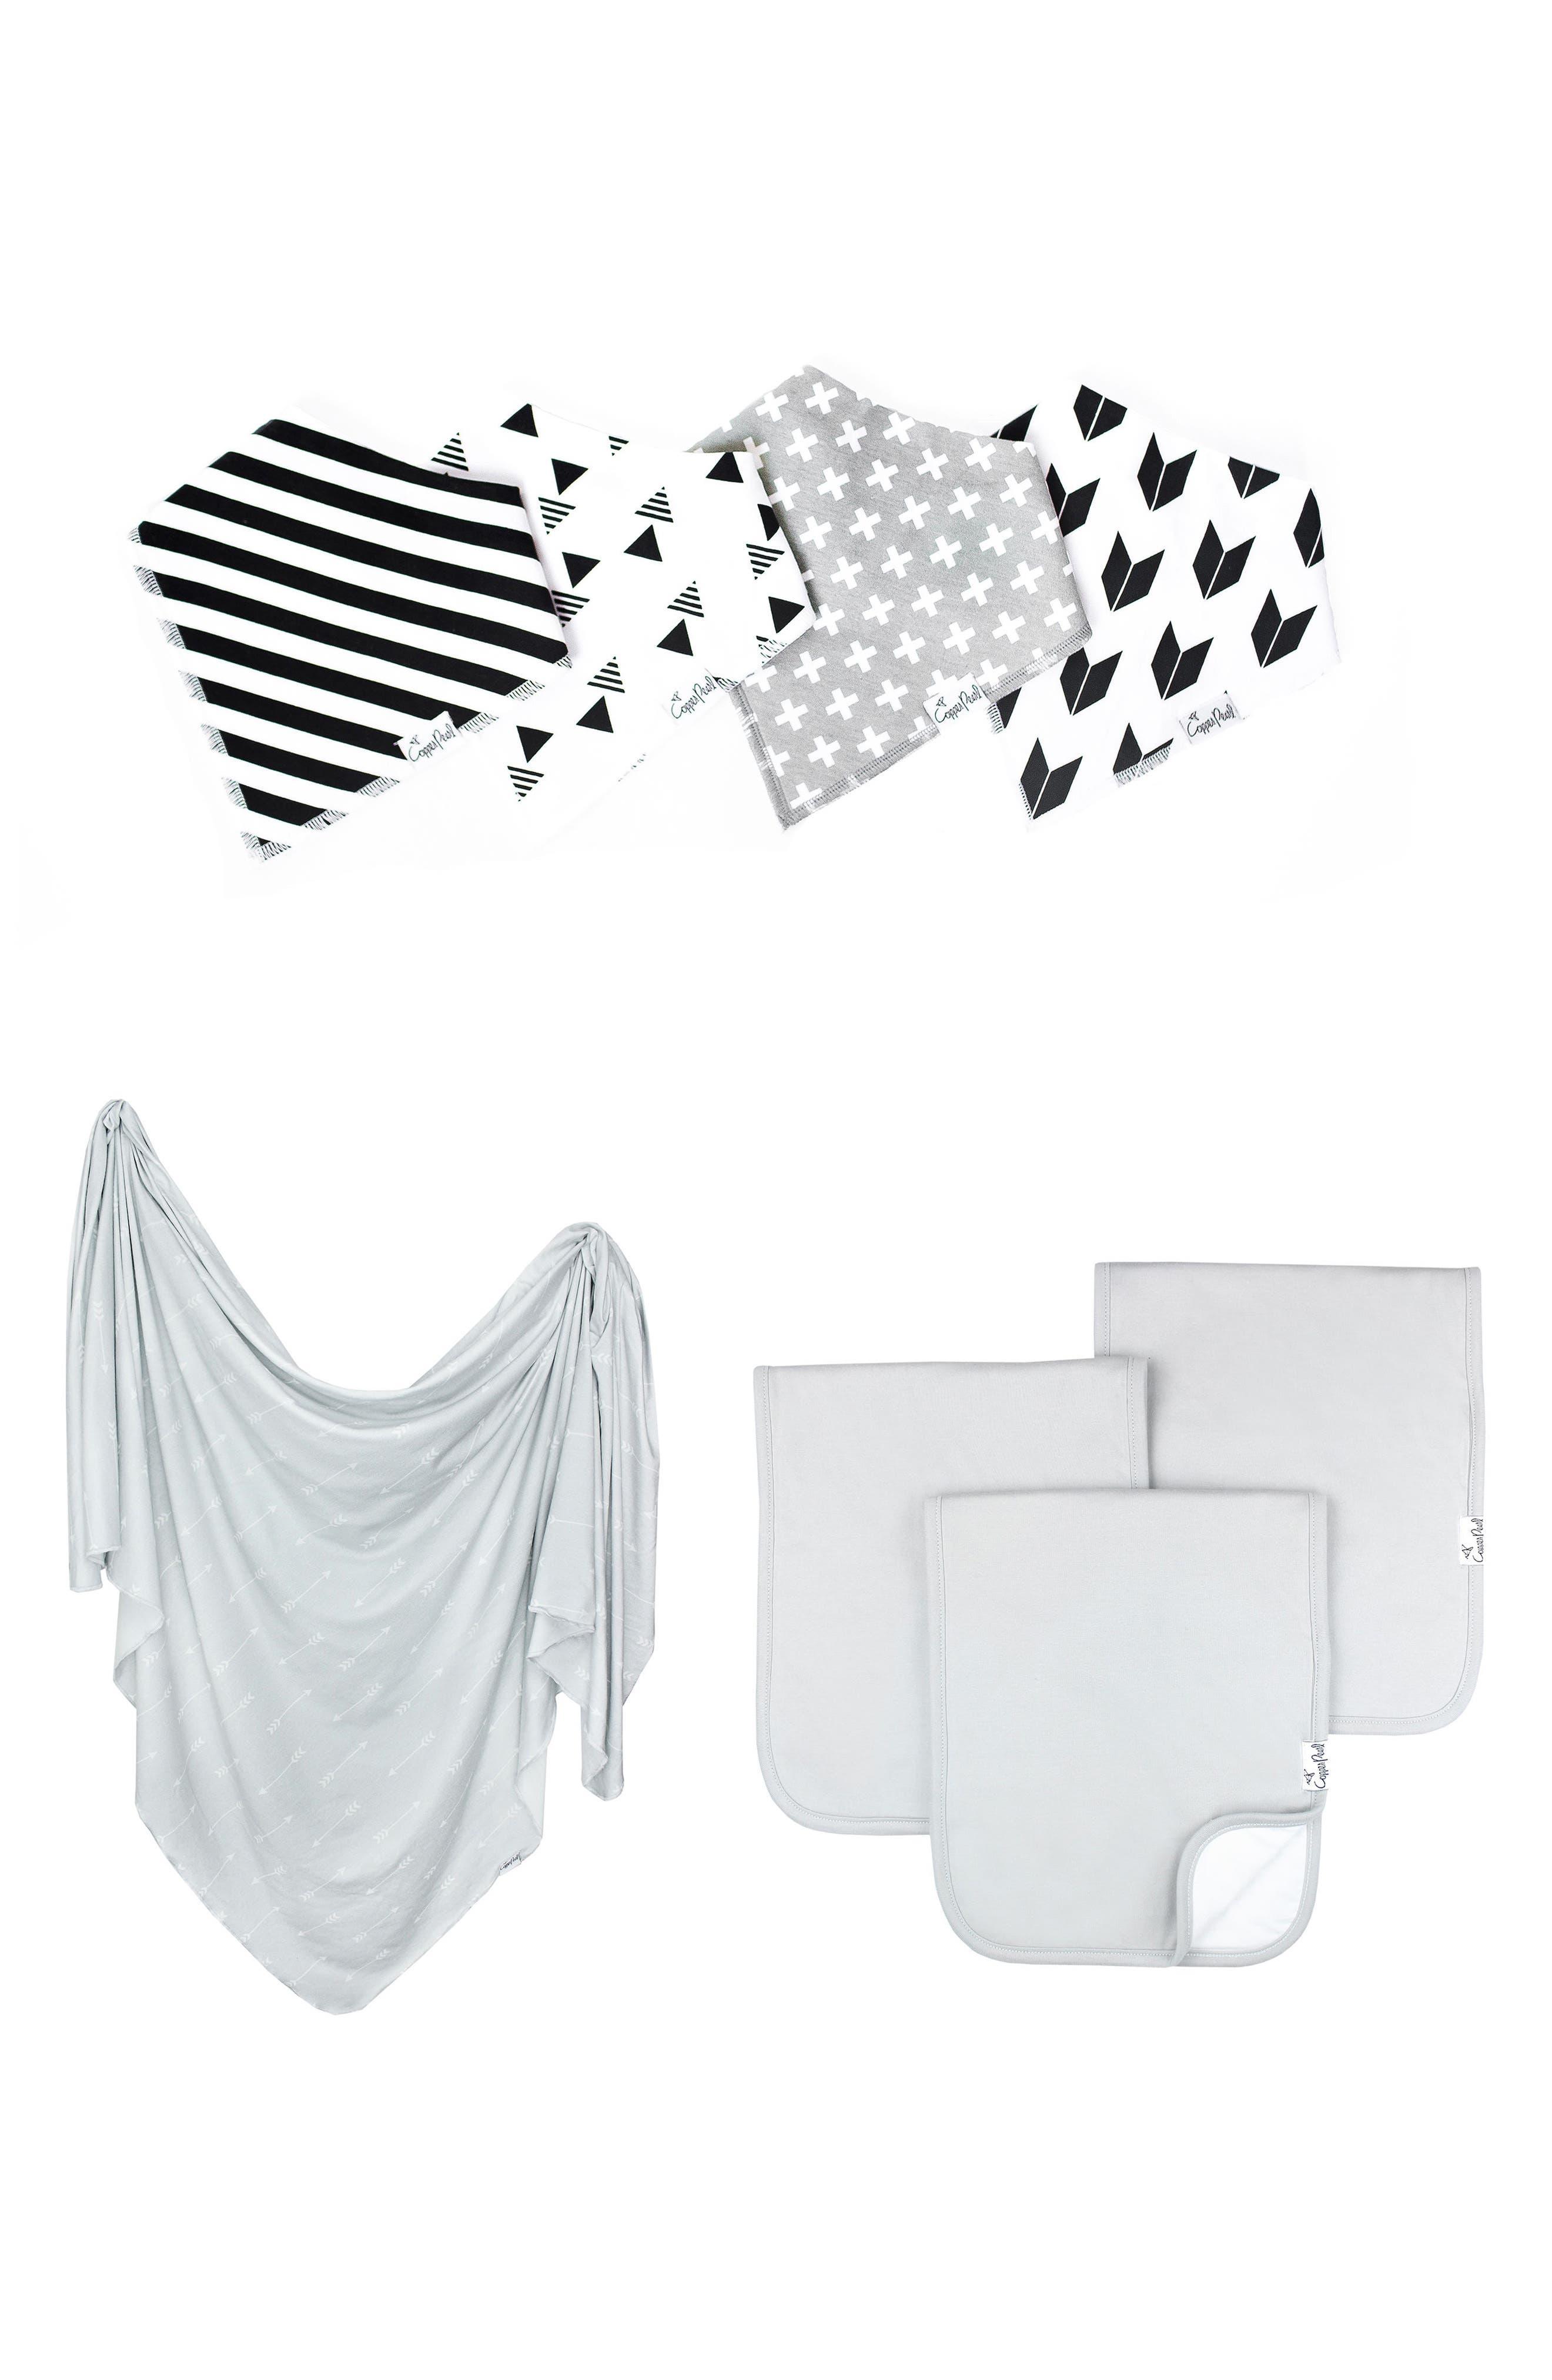 Main Image - Copper Pearl Shade Bib, Burp Cloth & Swaddle Blanket Gift Set